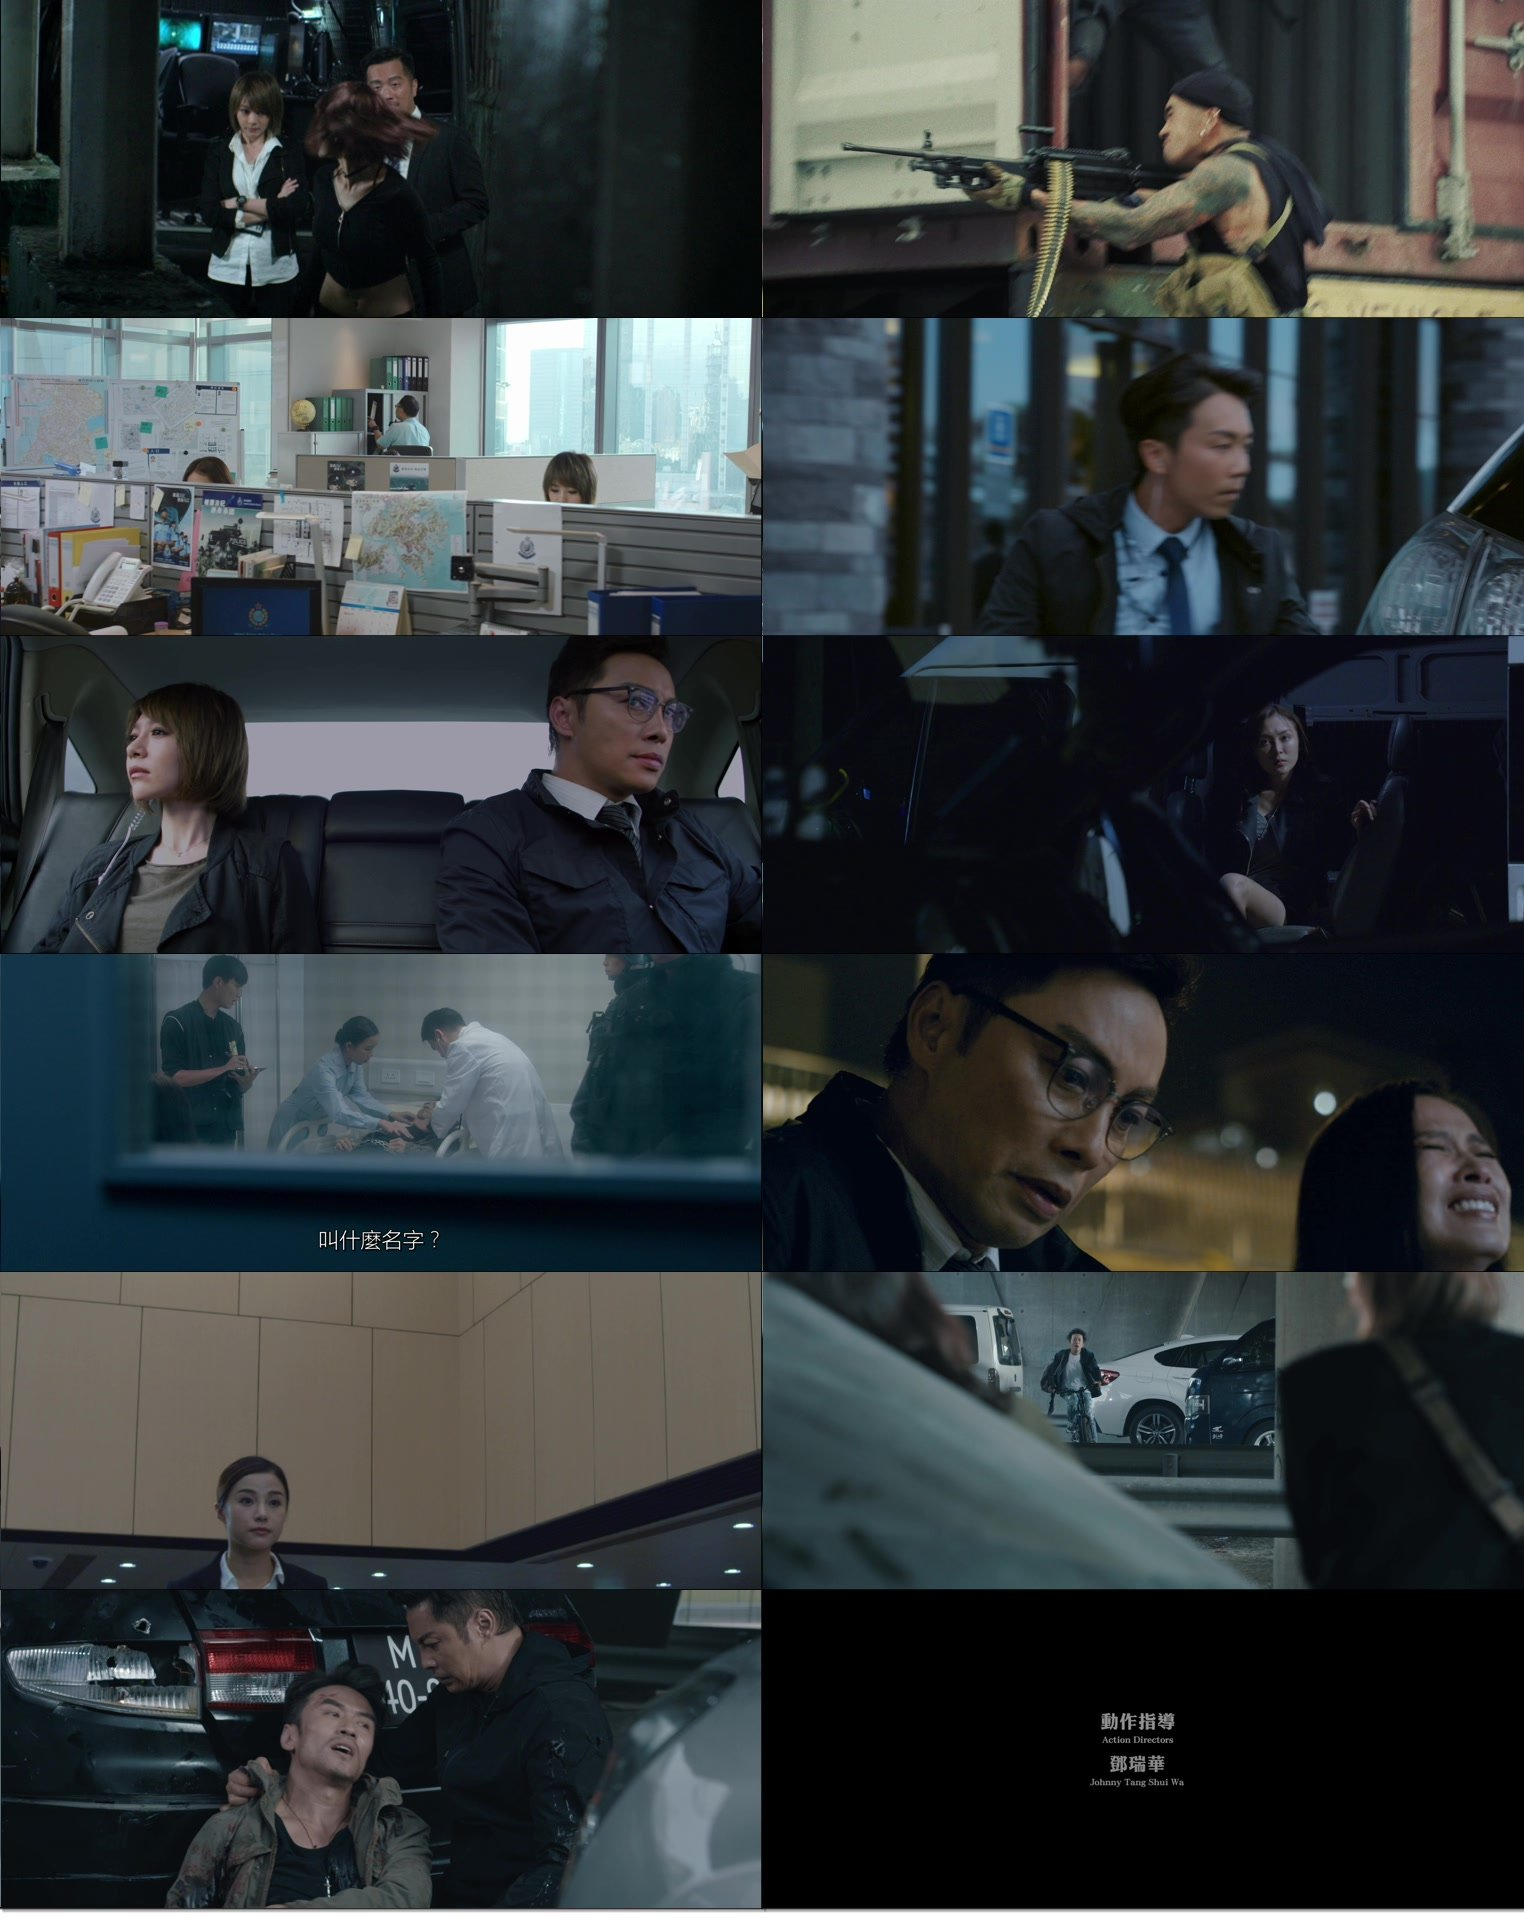 The.Fatal.Raid.2019.CHINESE.1080p.BluRay.x264-WiKi.mkv